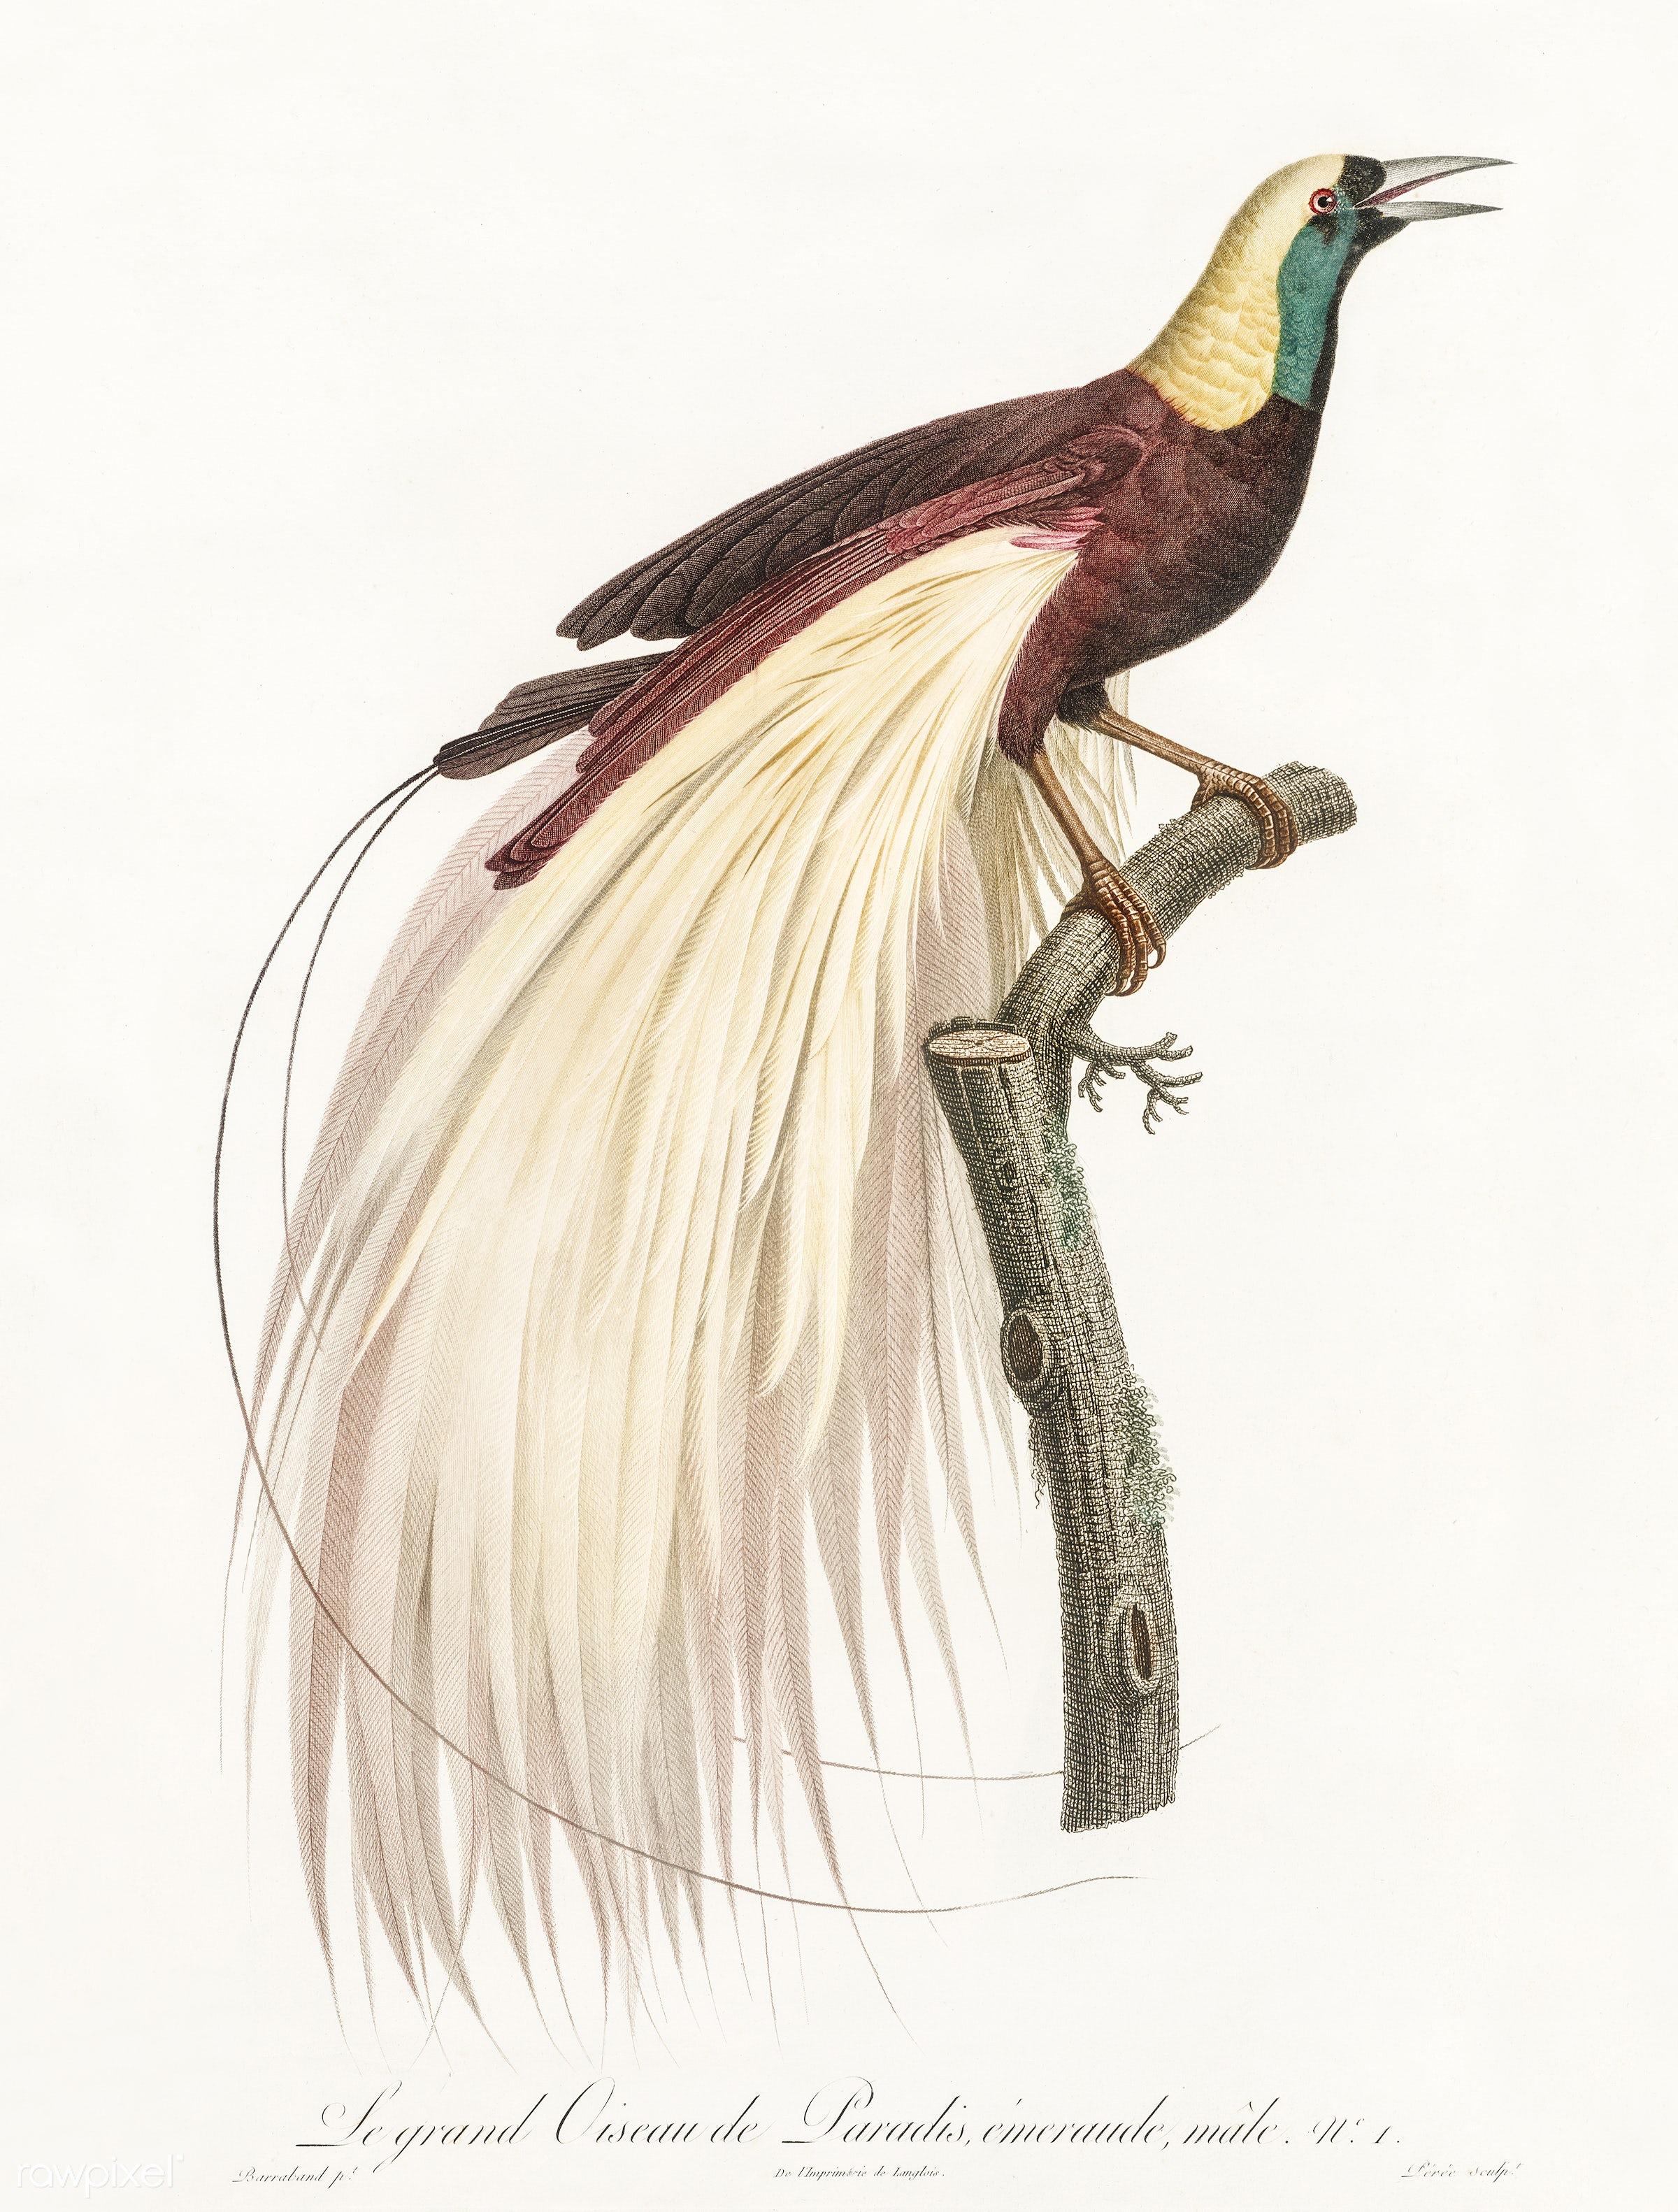 Emperor bird-of-paradise, male from Histoire Naturelle des Oiseaux ...